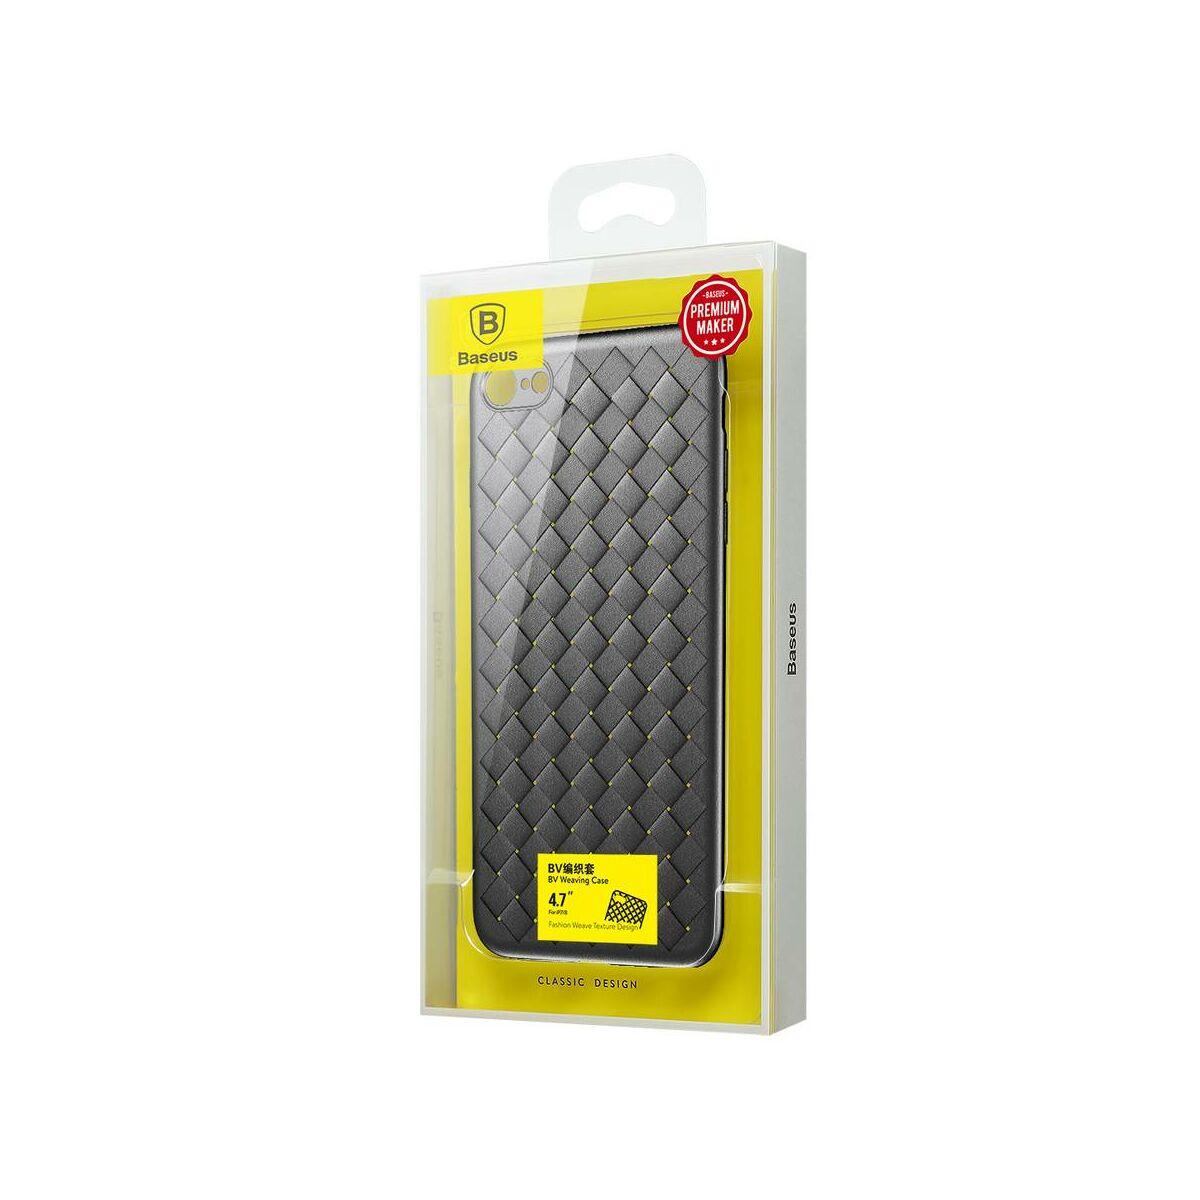 Baseus iPhone 6/6s tok, BV Weaving, fekete (WIAPIPH6S-BV01)